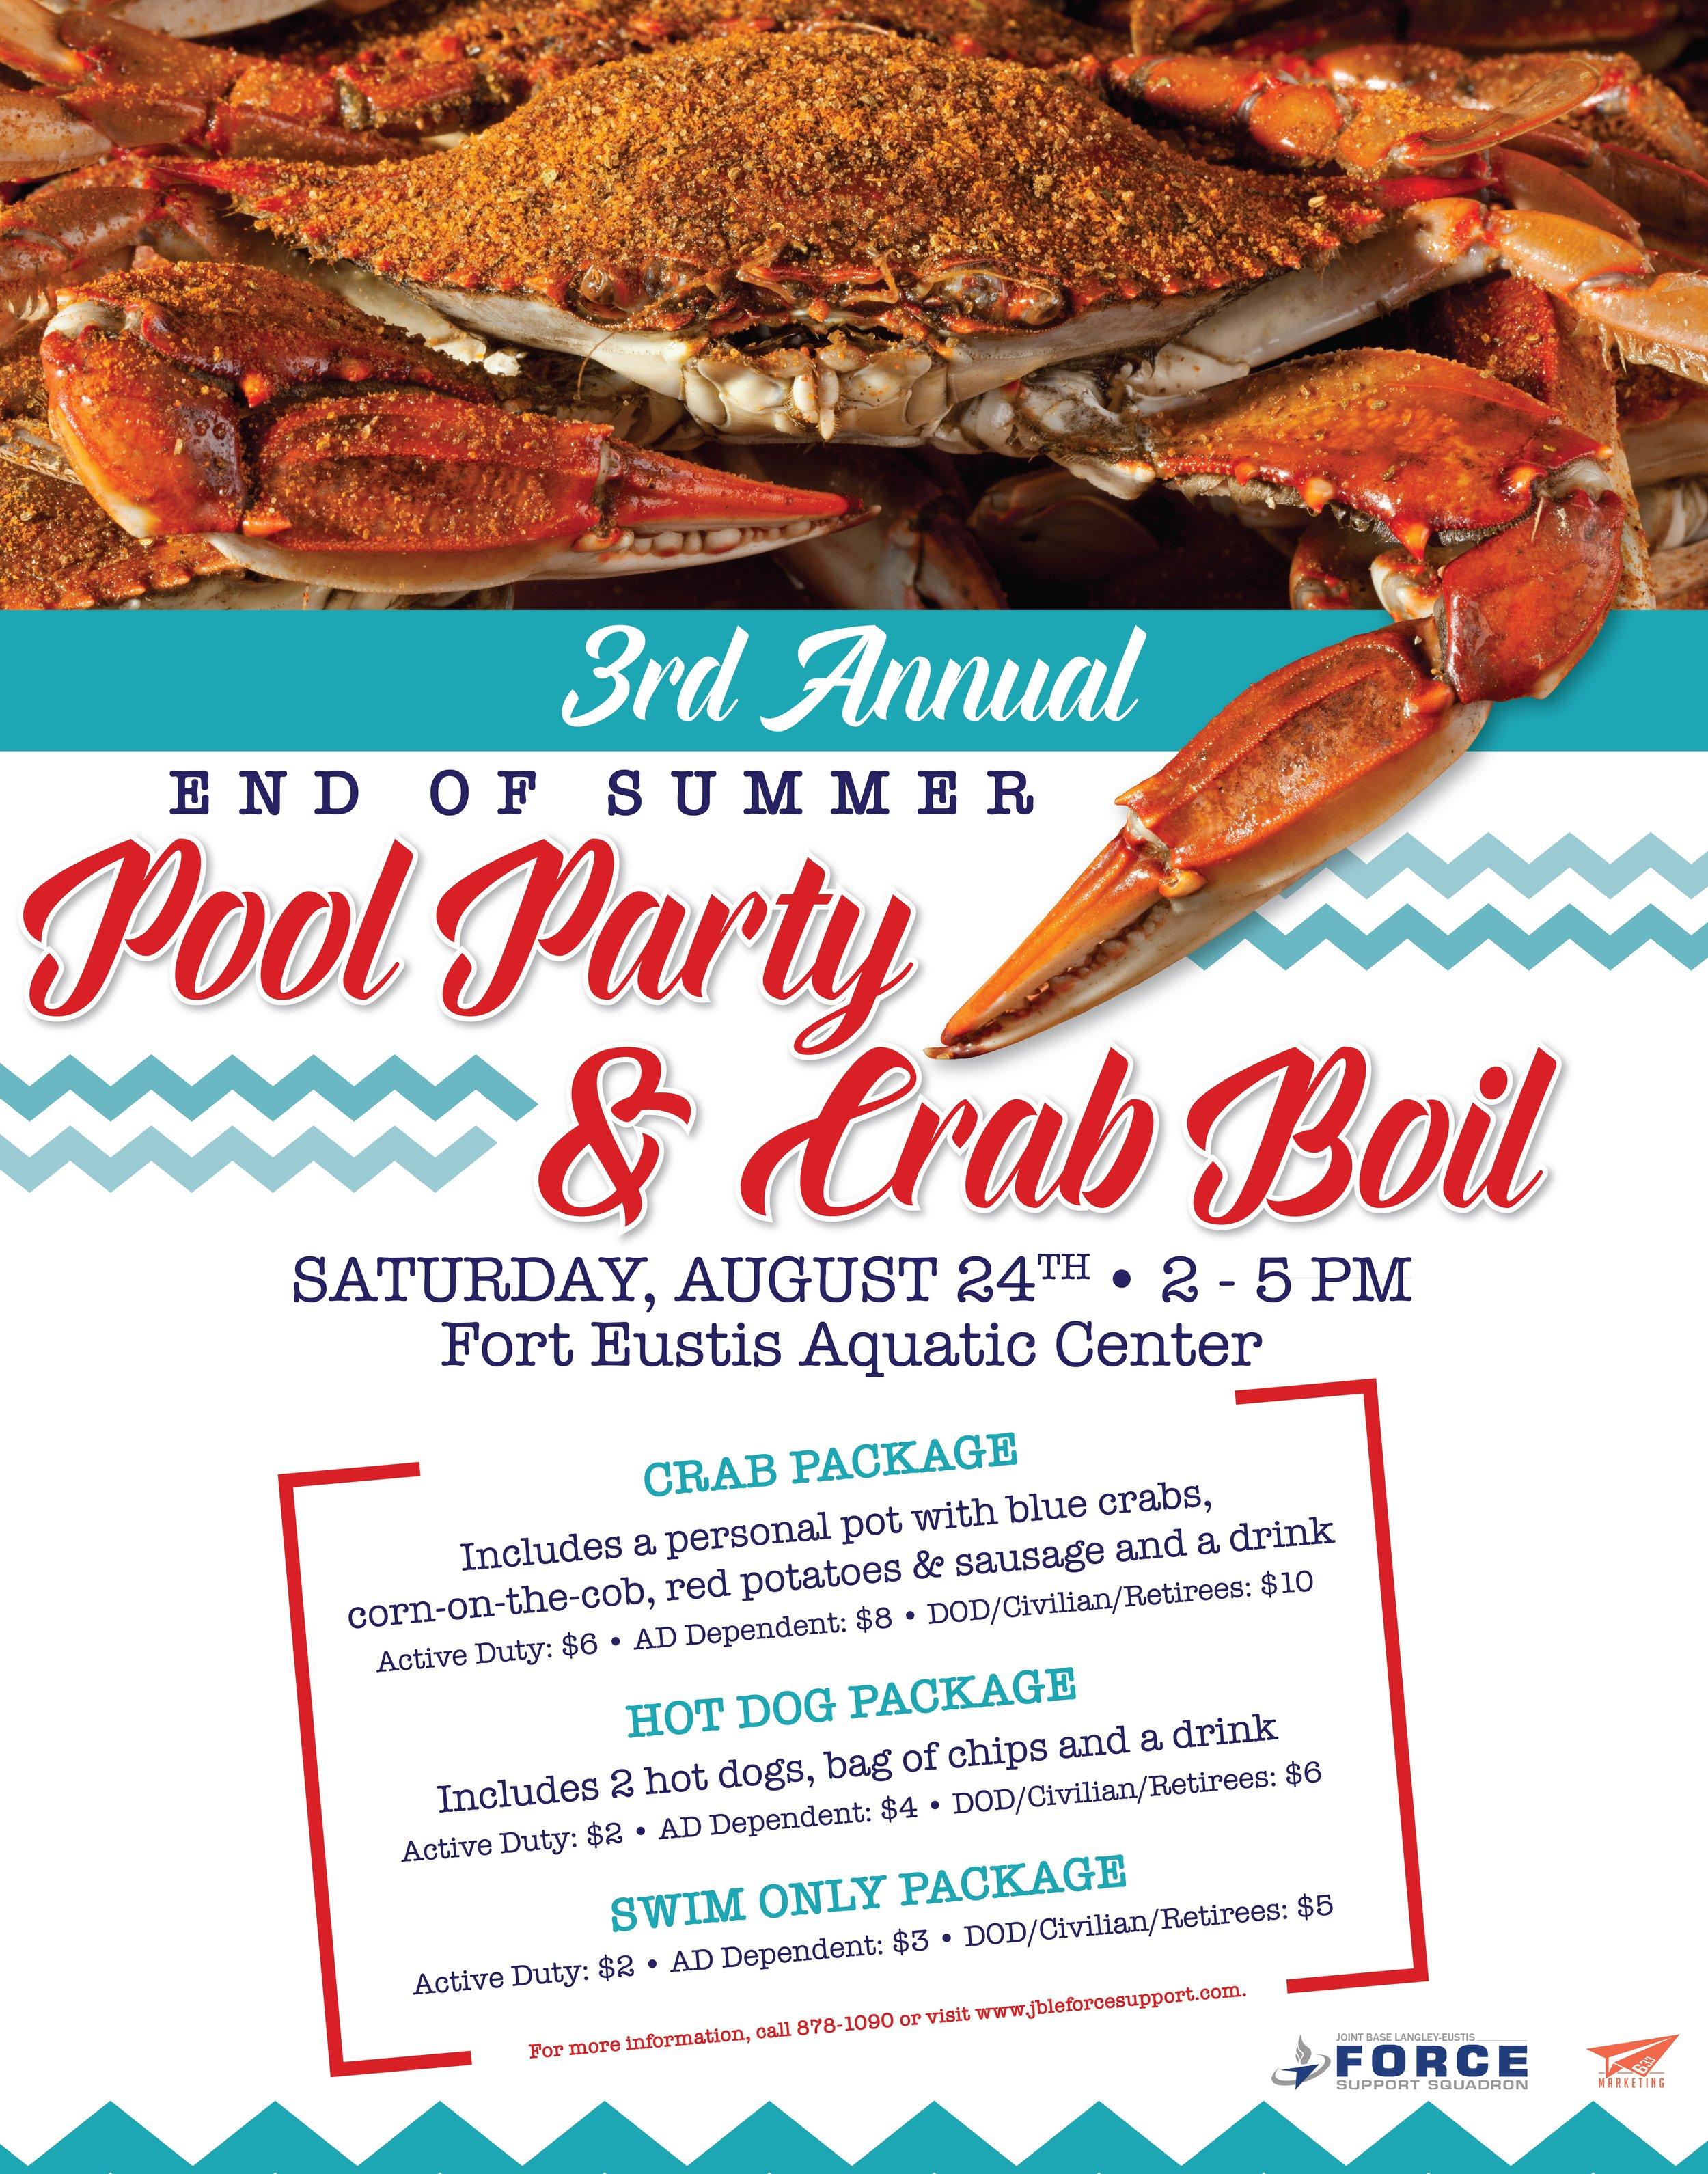 08-19 Crab Boil.jpg